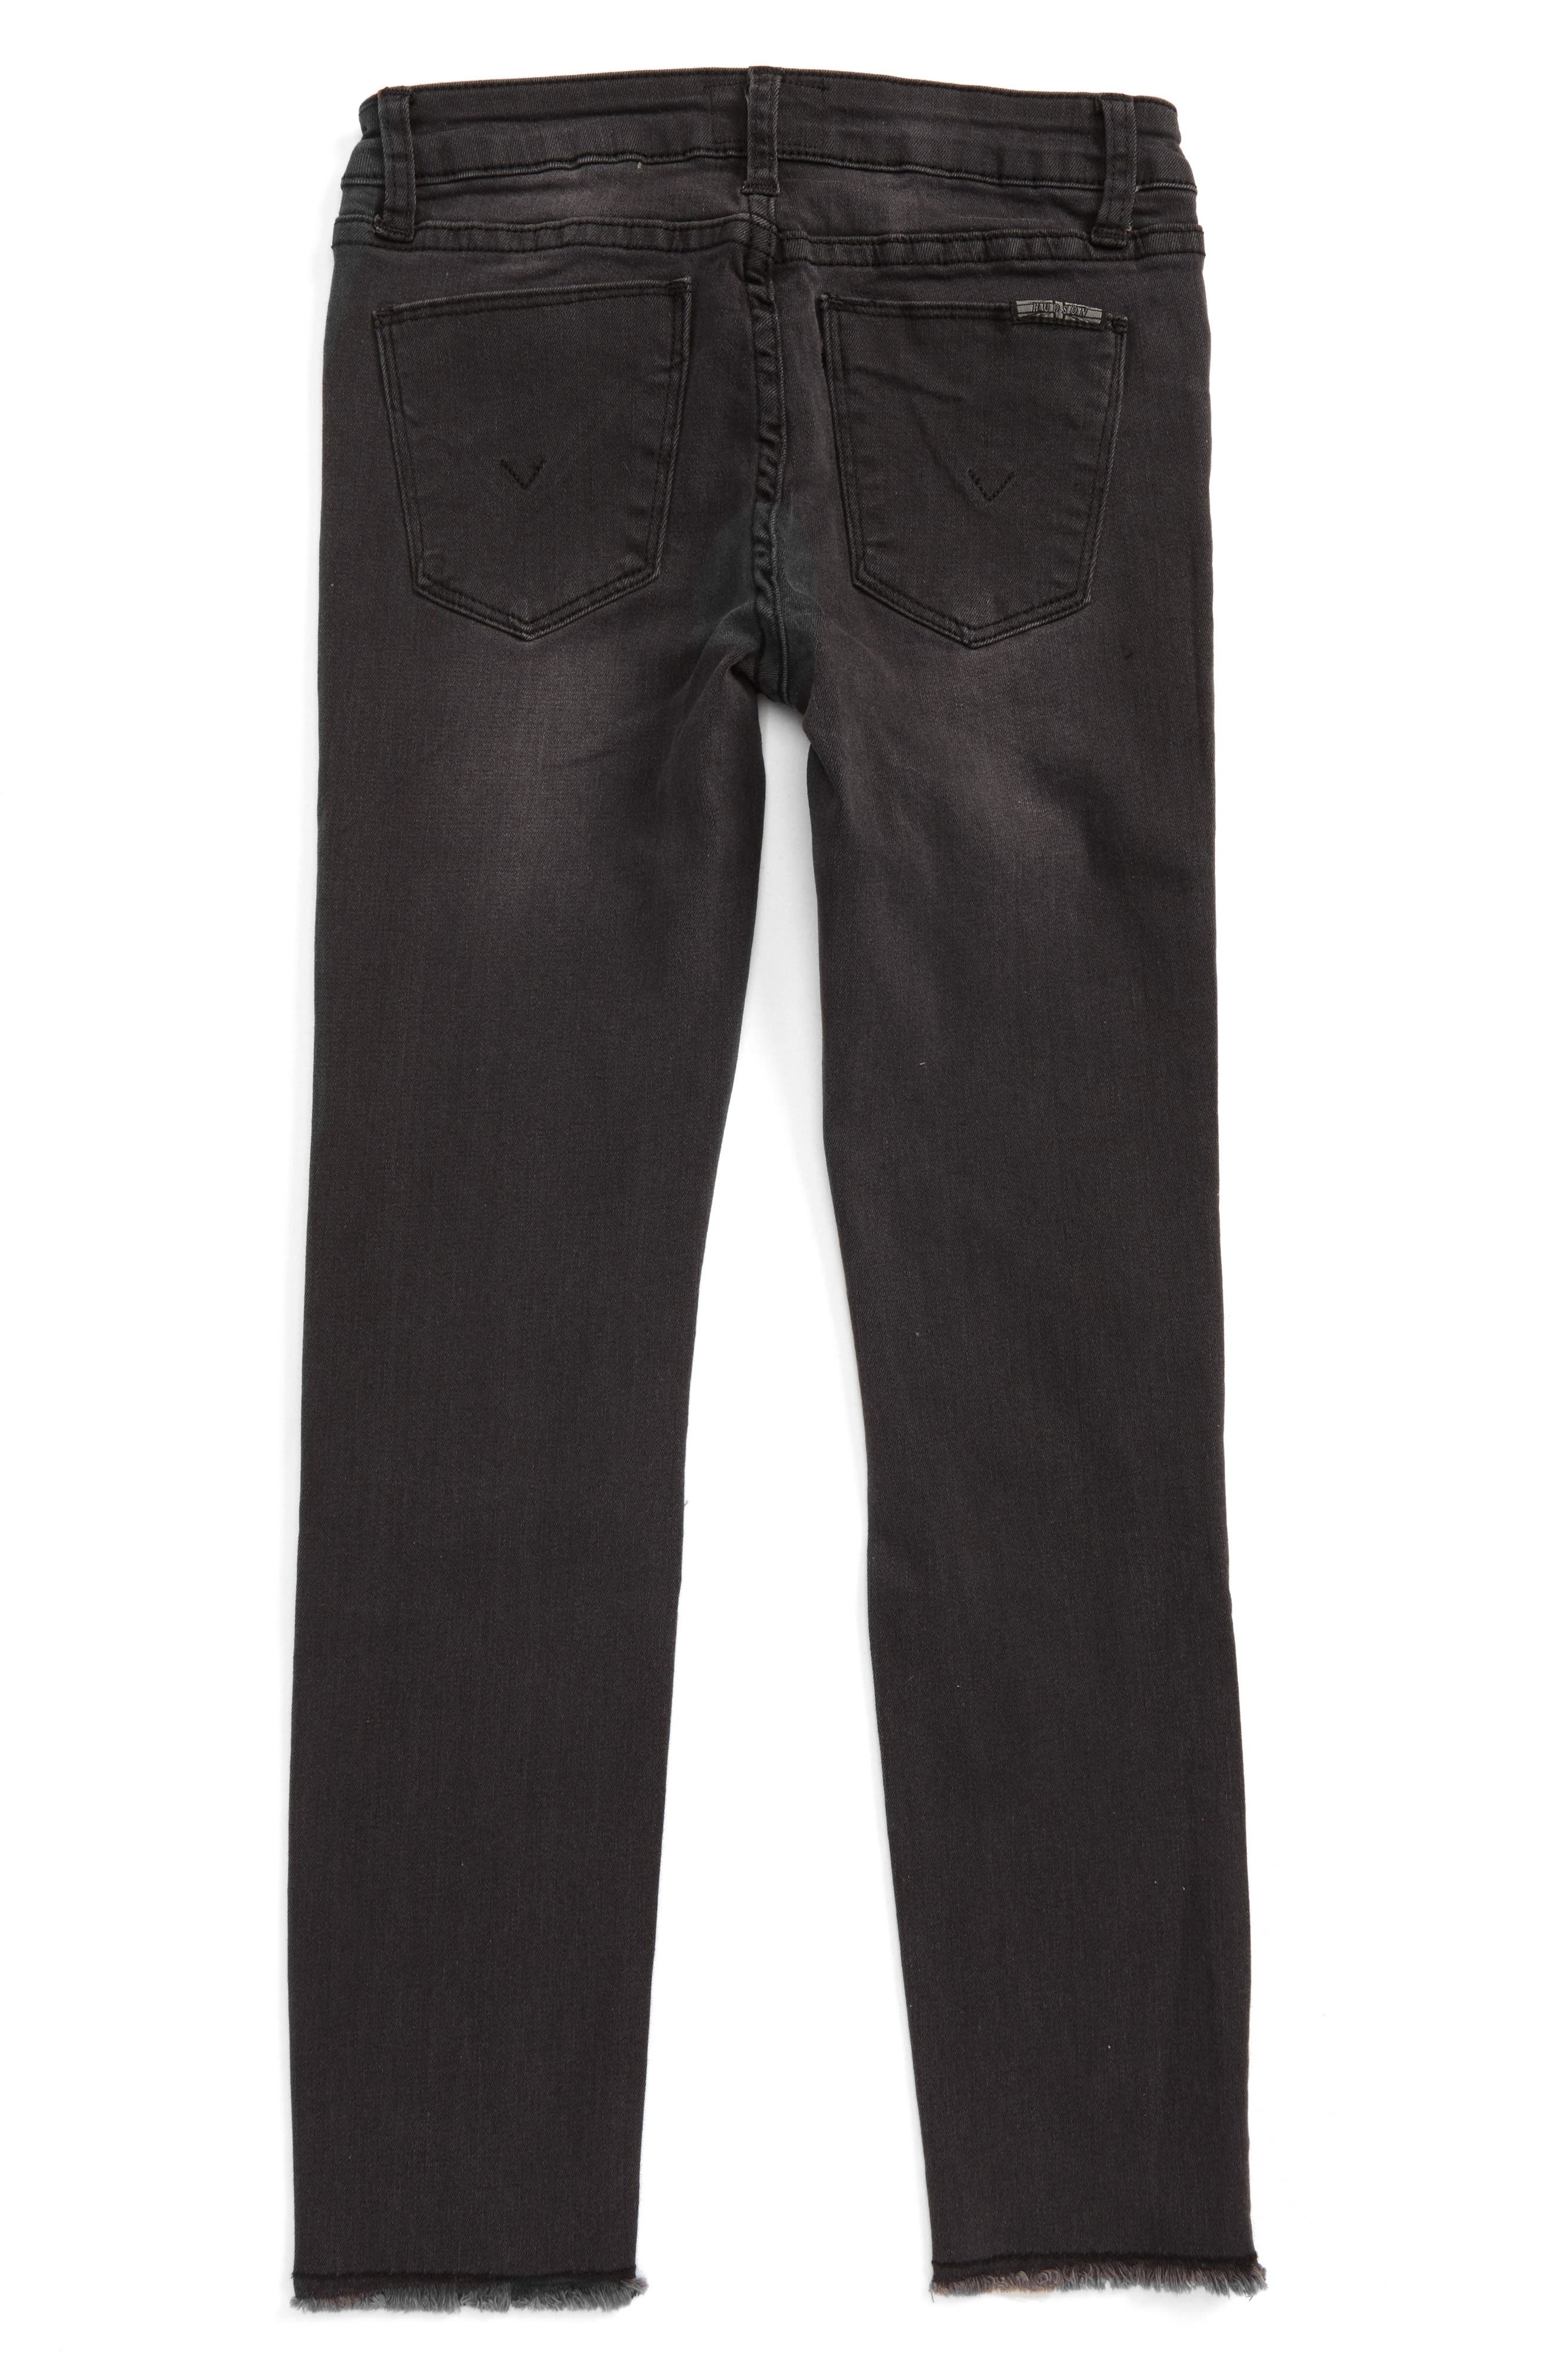 Alternate Image 2  - Hudson Kids Black Iris Skinny Jeans (Big Girls)